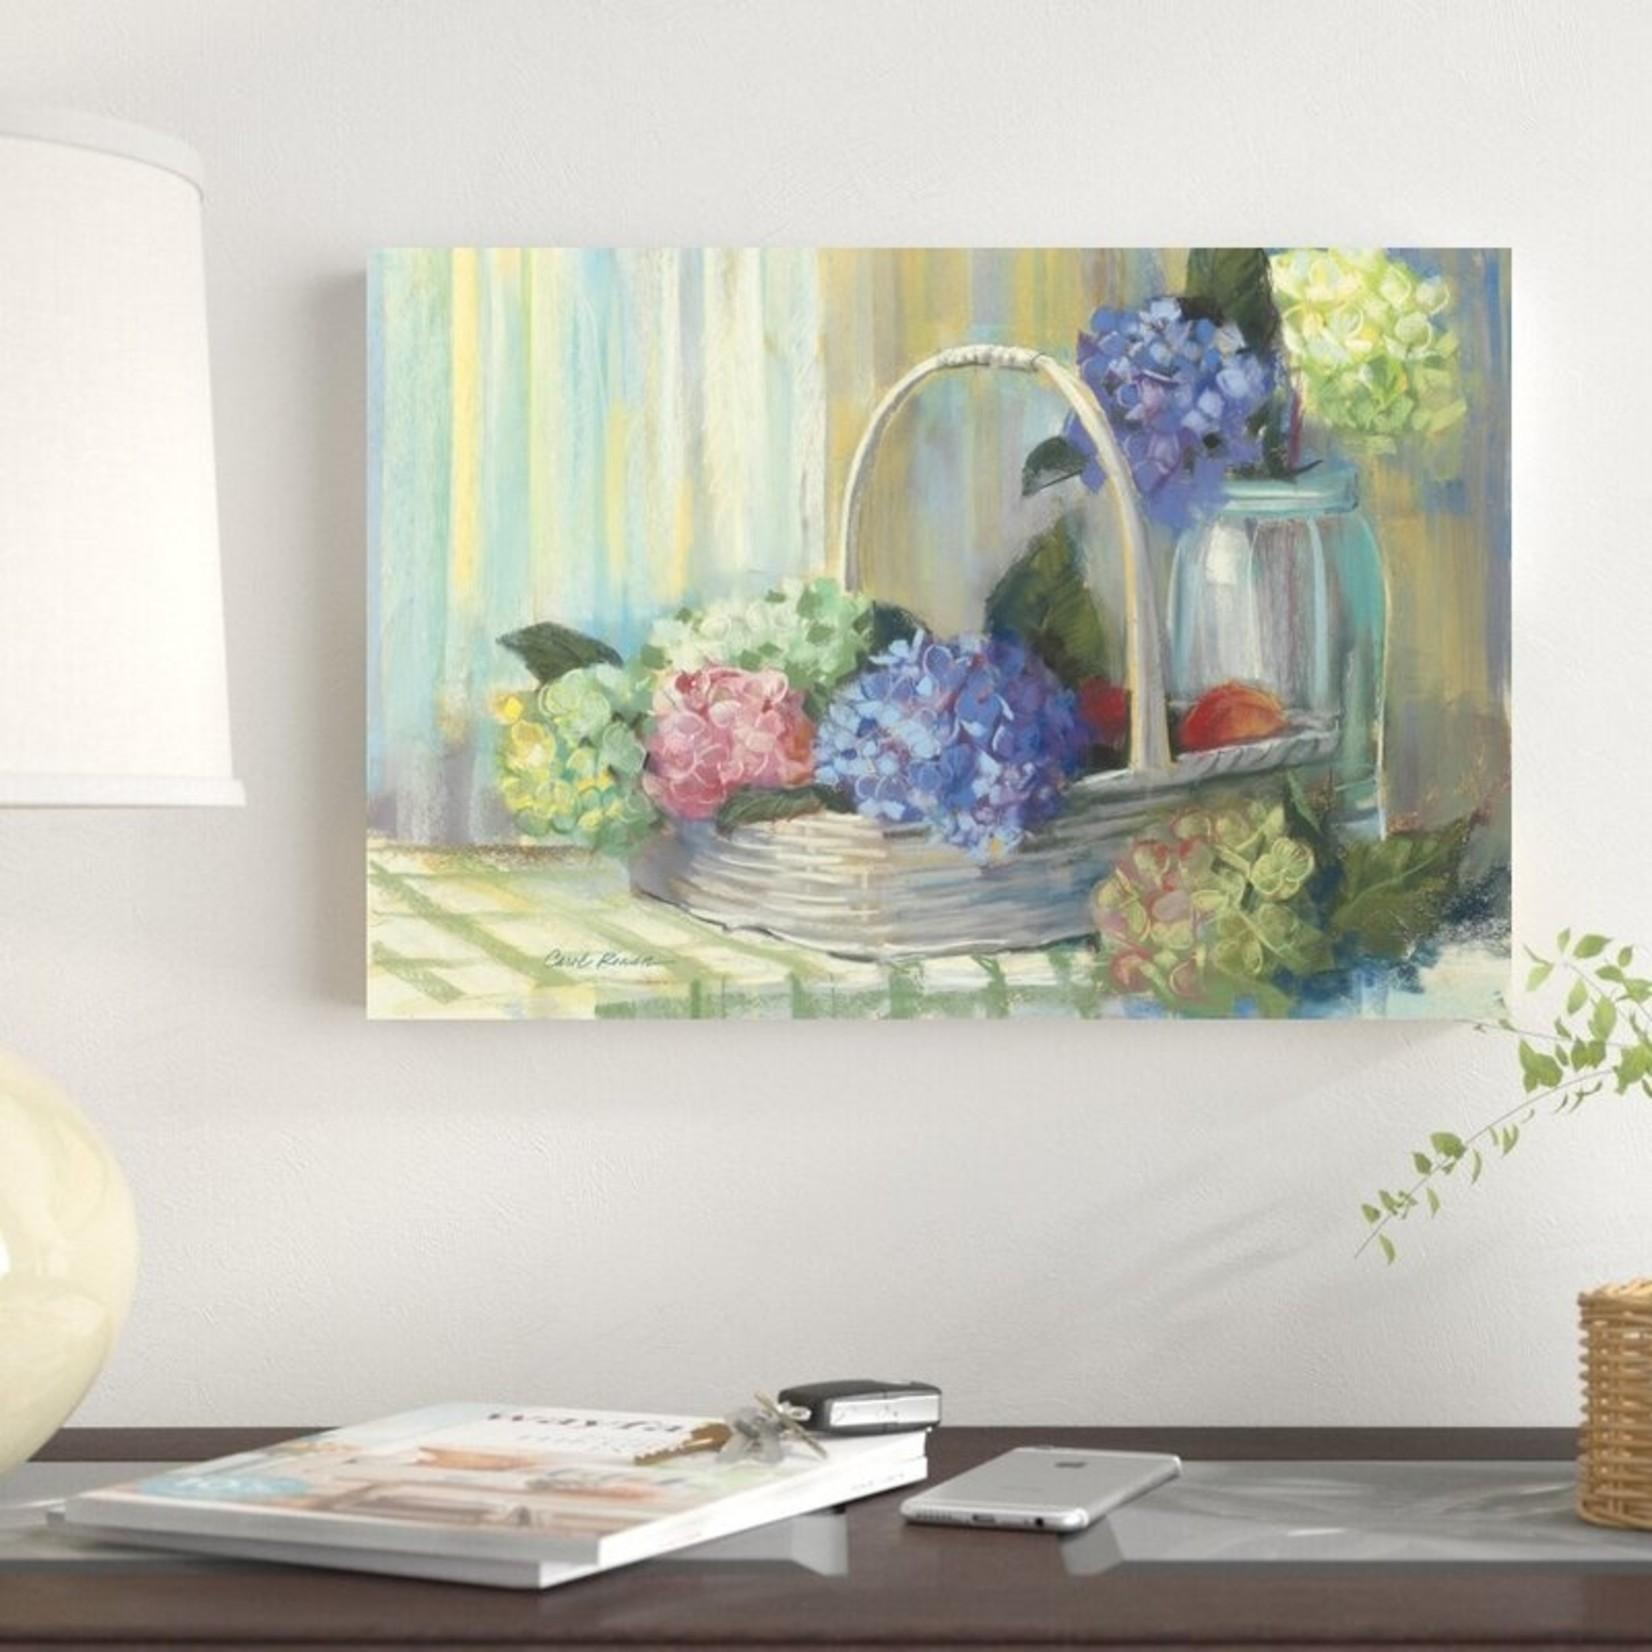 "*12"" x 18"" - Hydrangea Basket by Carol Rowan - Wrapped Canvas Painting Print"